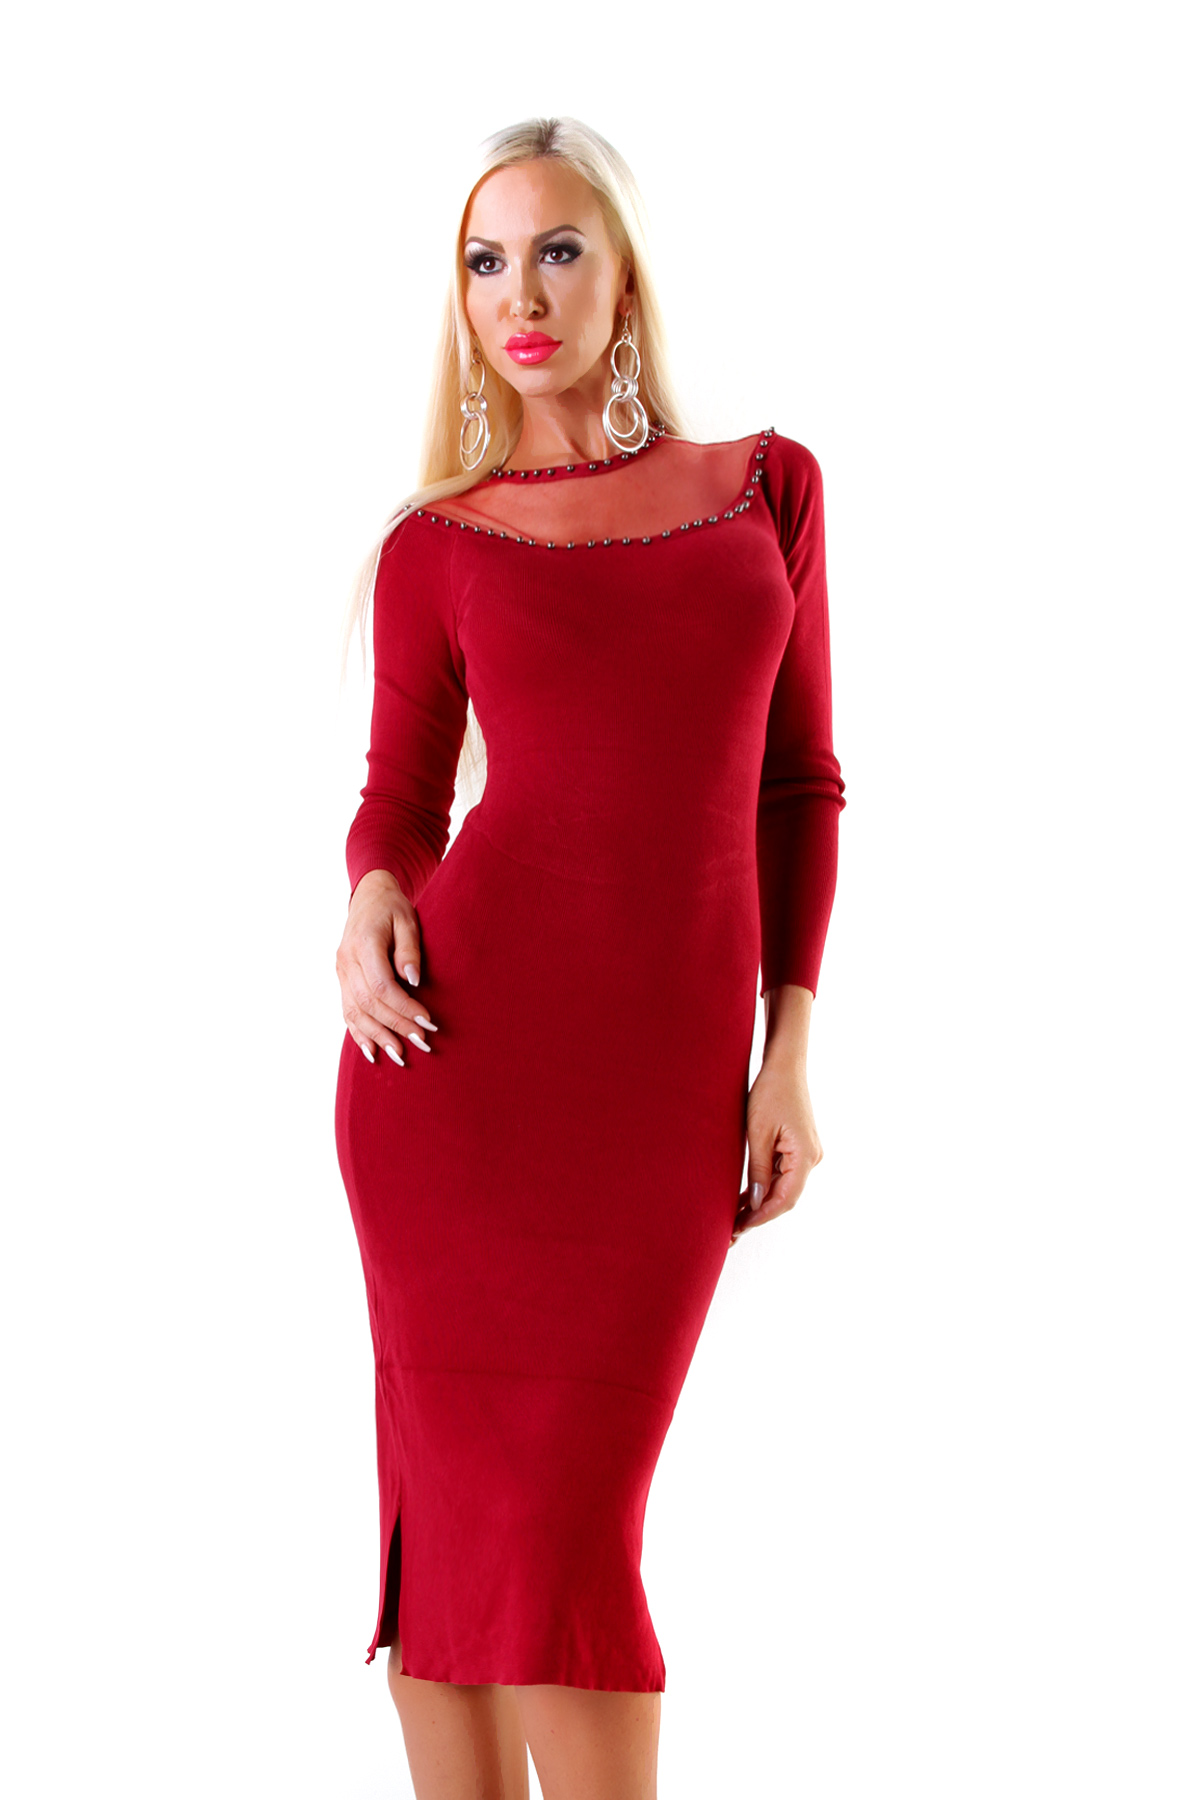 Rode Lange Jurk.Wijnrode Lange Jurk Met Tule En Studs Be Yourself Fashion